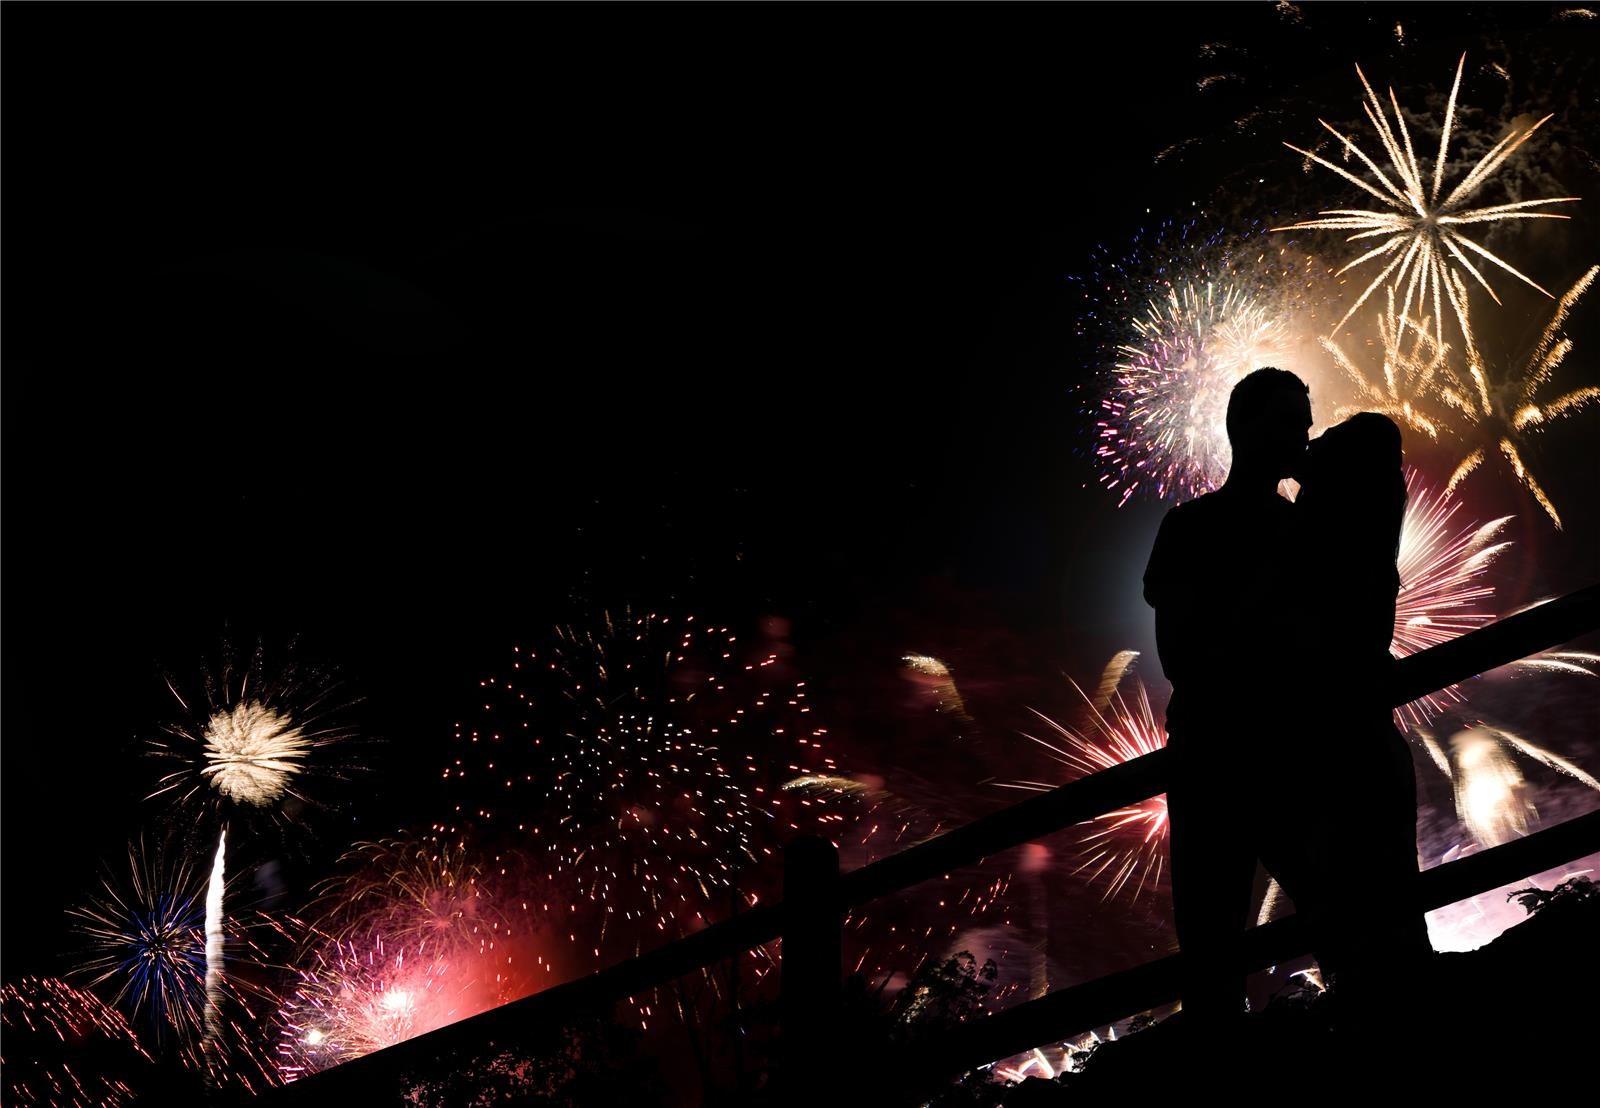 נשיקה בסילבסטר (צילום: Shutterstock)